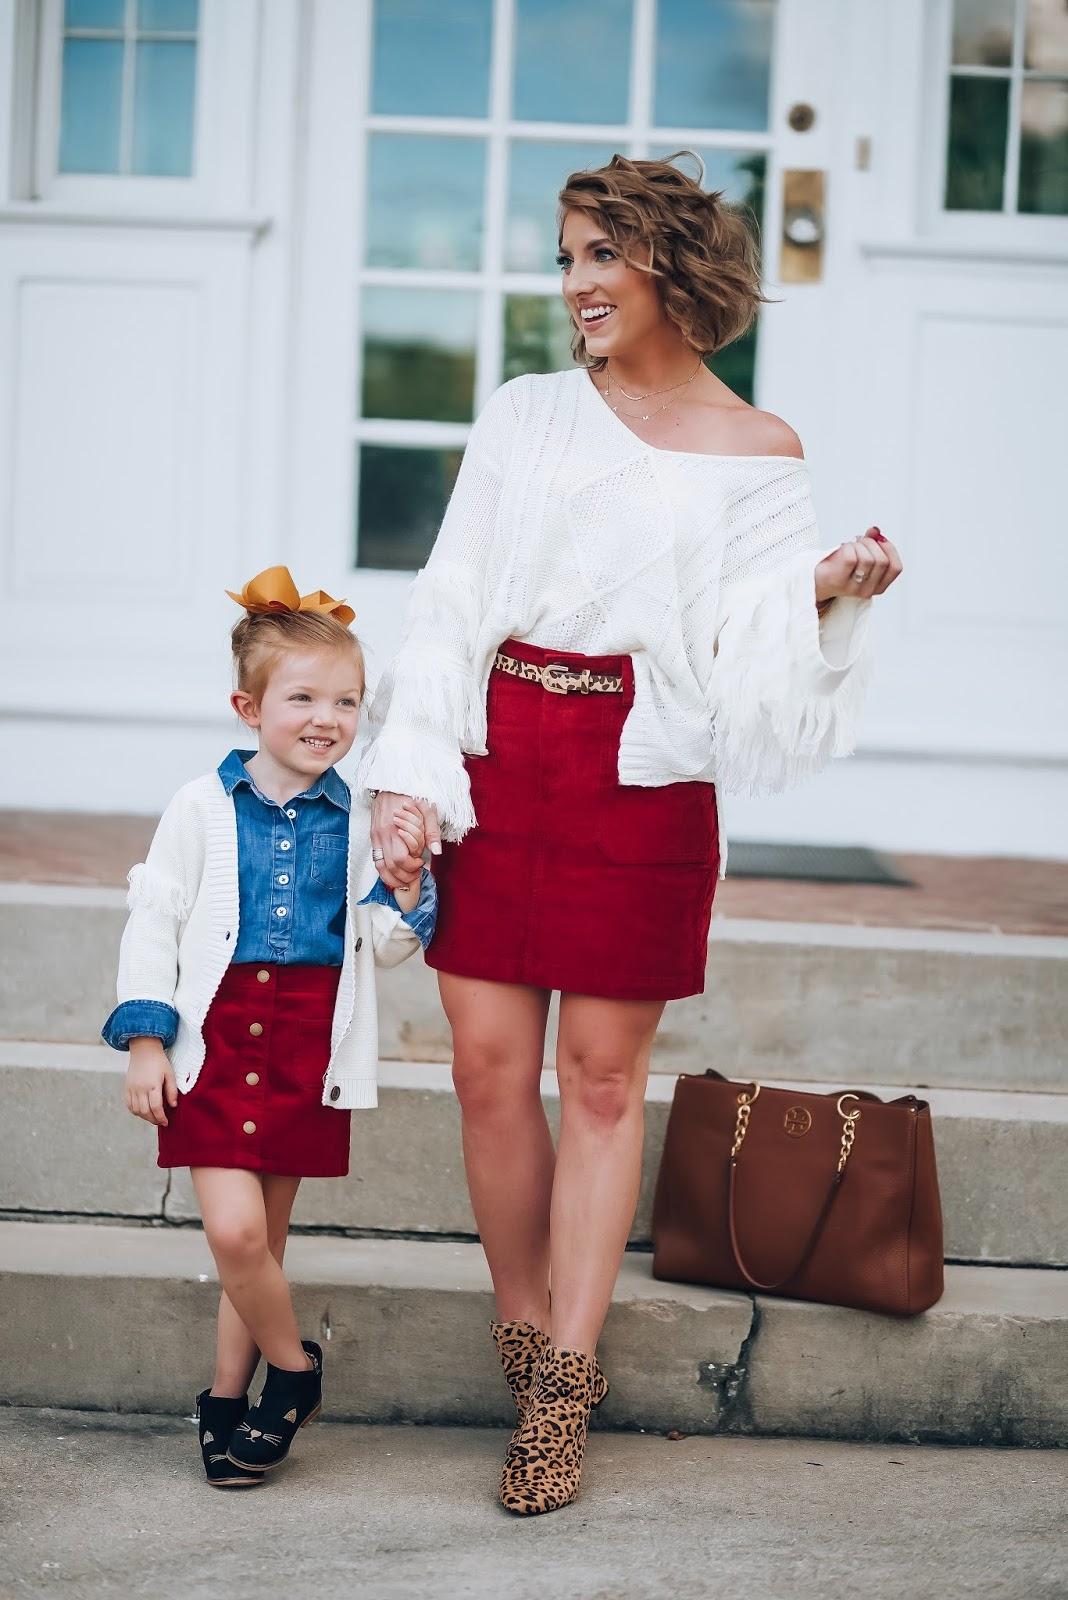 Fall Style: Corduroy Skirts & Fringe Detail Sweaters - Something Delightful Blog